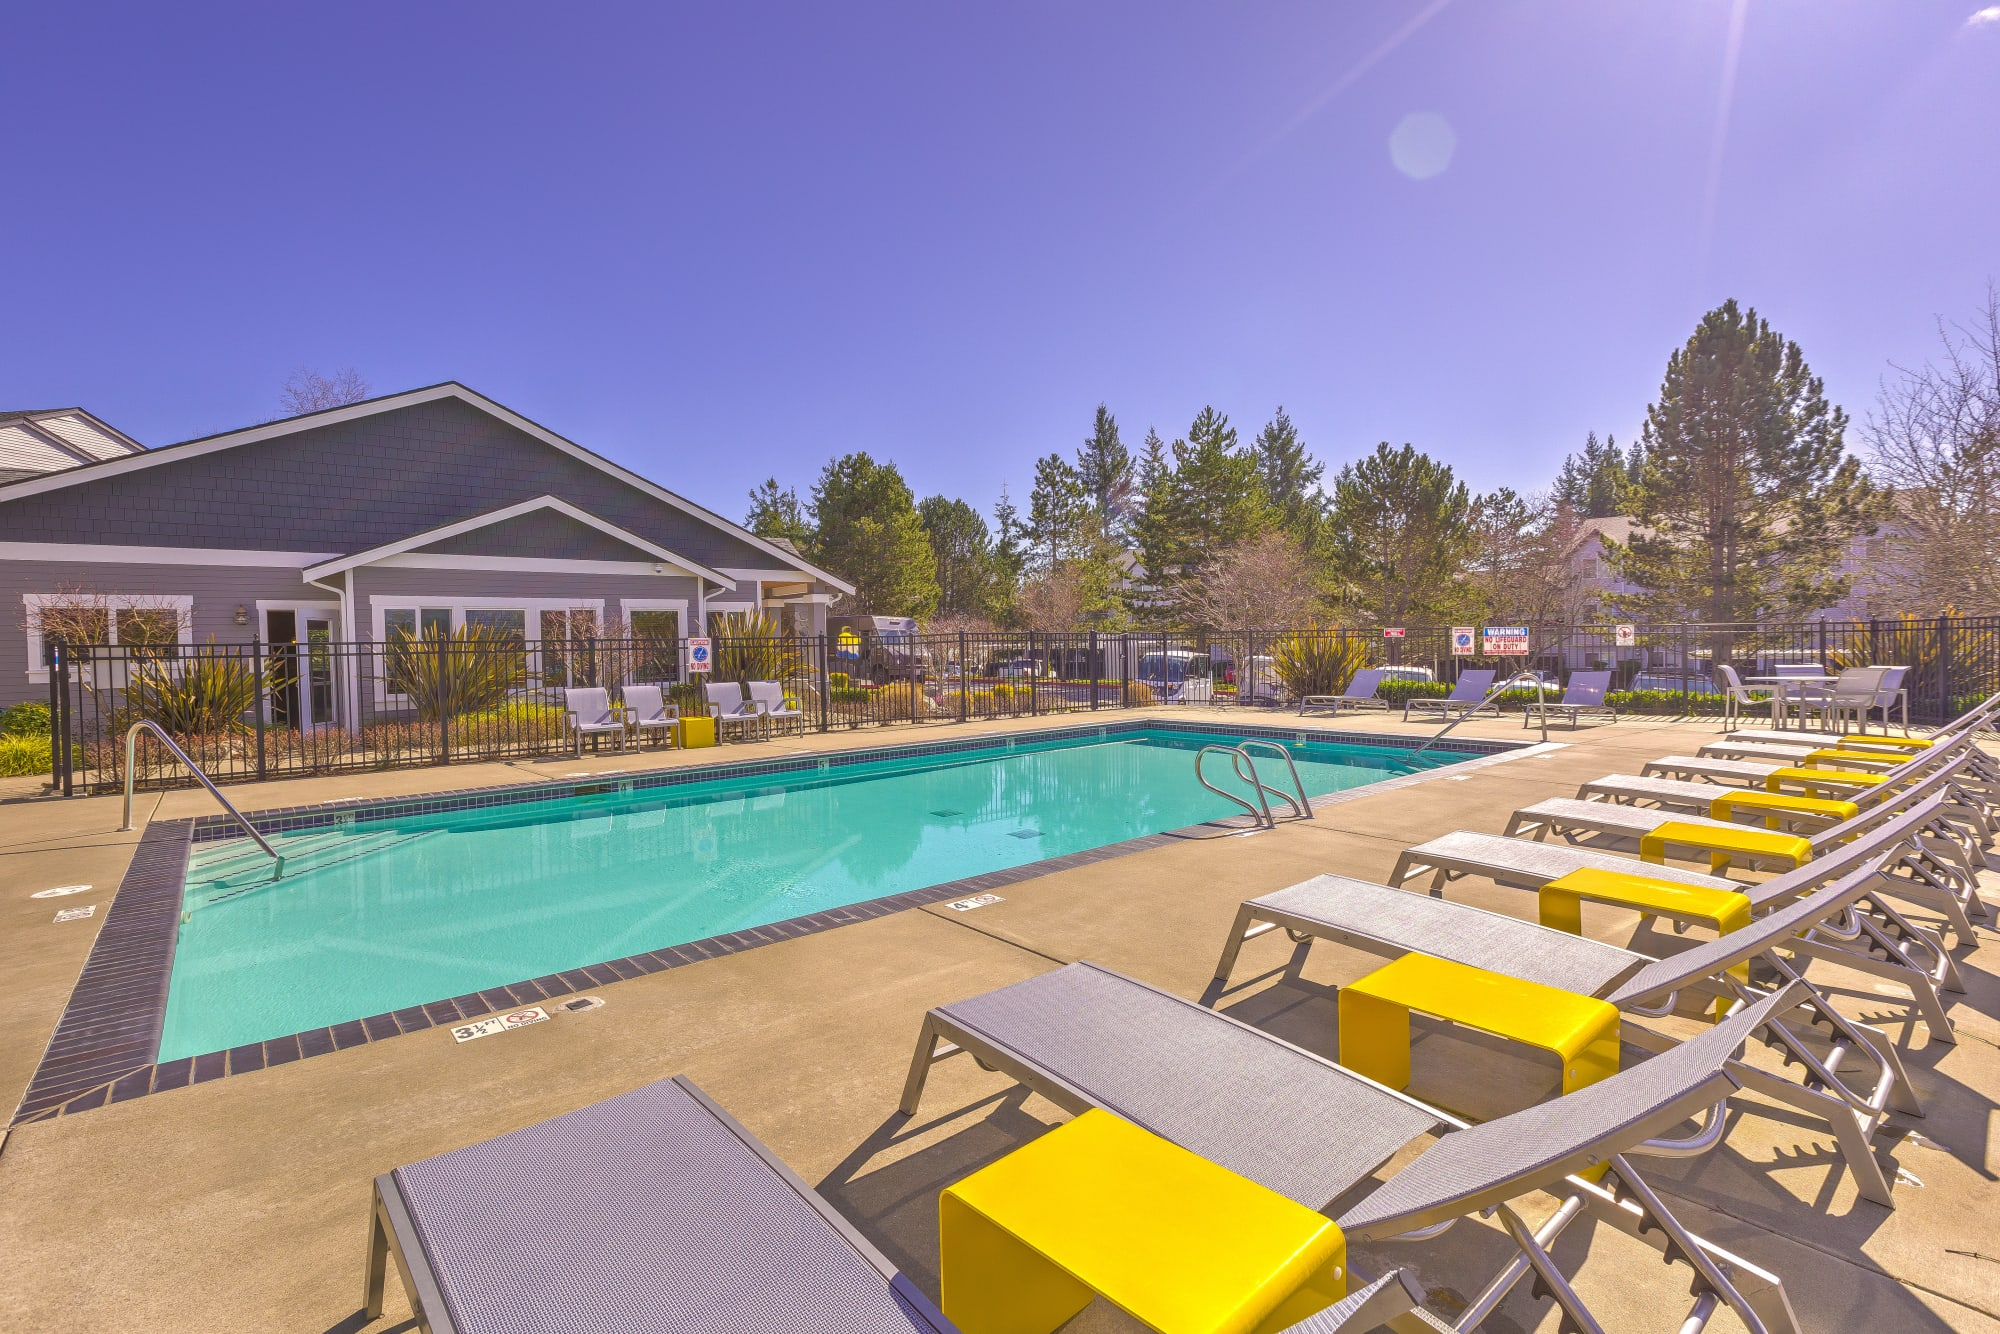 The sparkling pool at Cascade Ridge in Silverdale, Washington